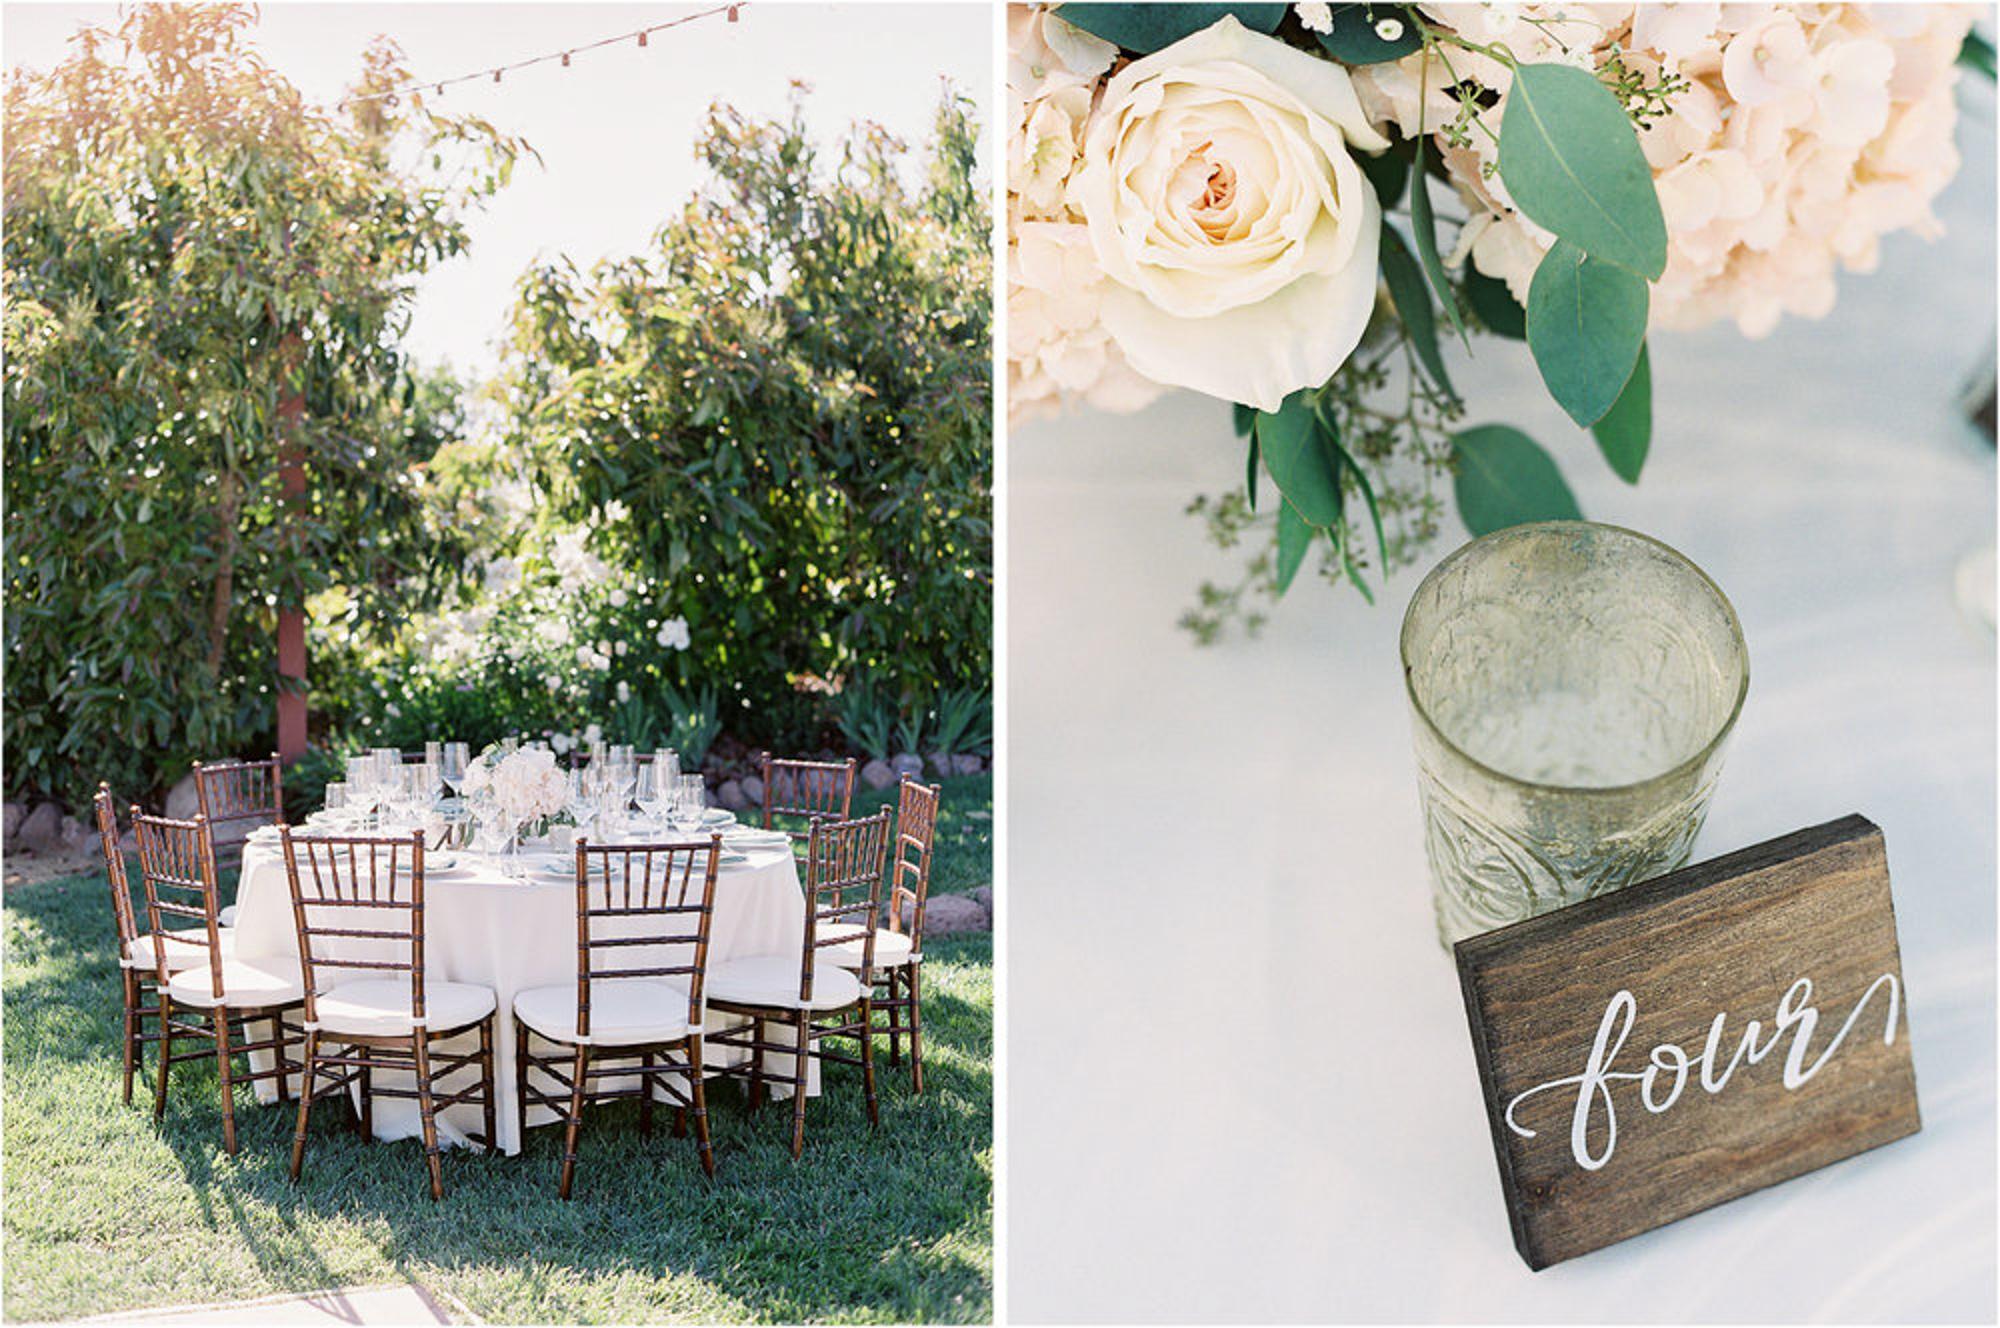 Gerry-Ranch-Wedding-Photography-Kristina-Adams-22.jpg